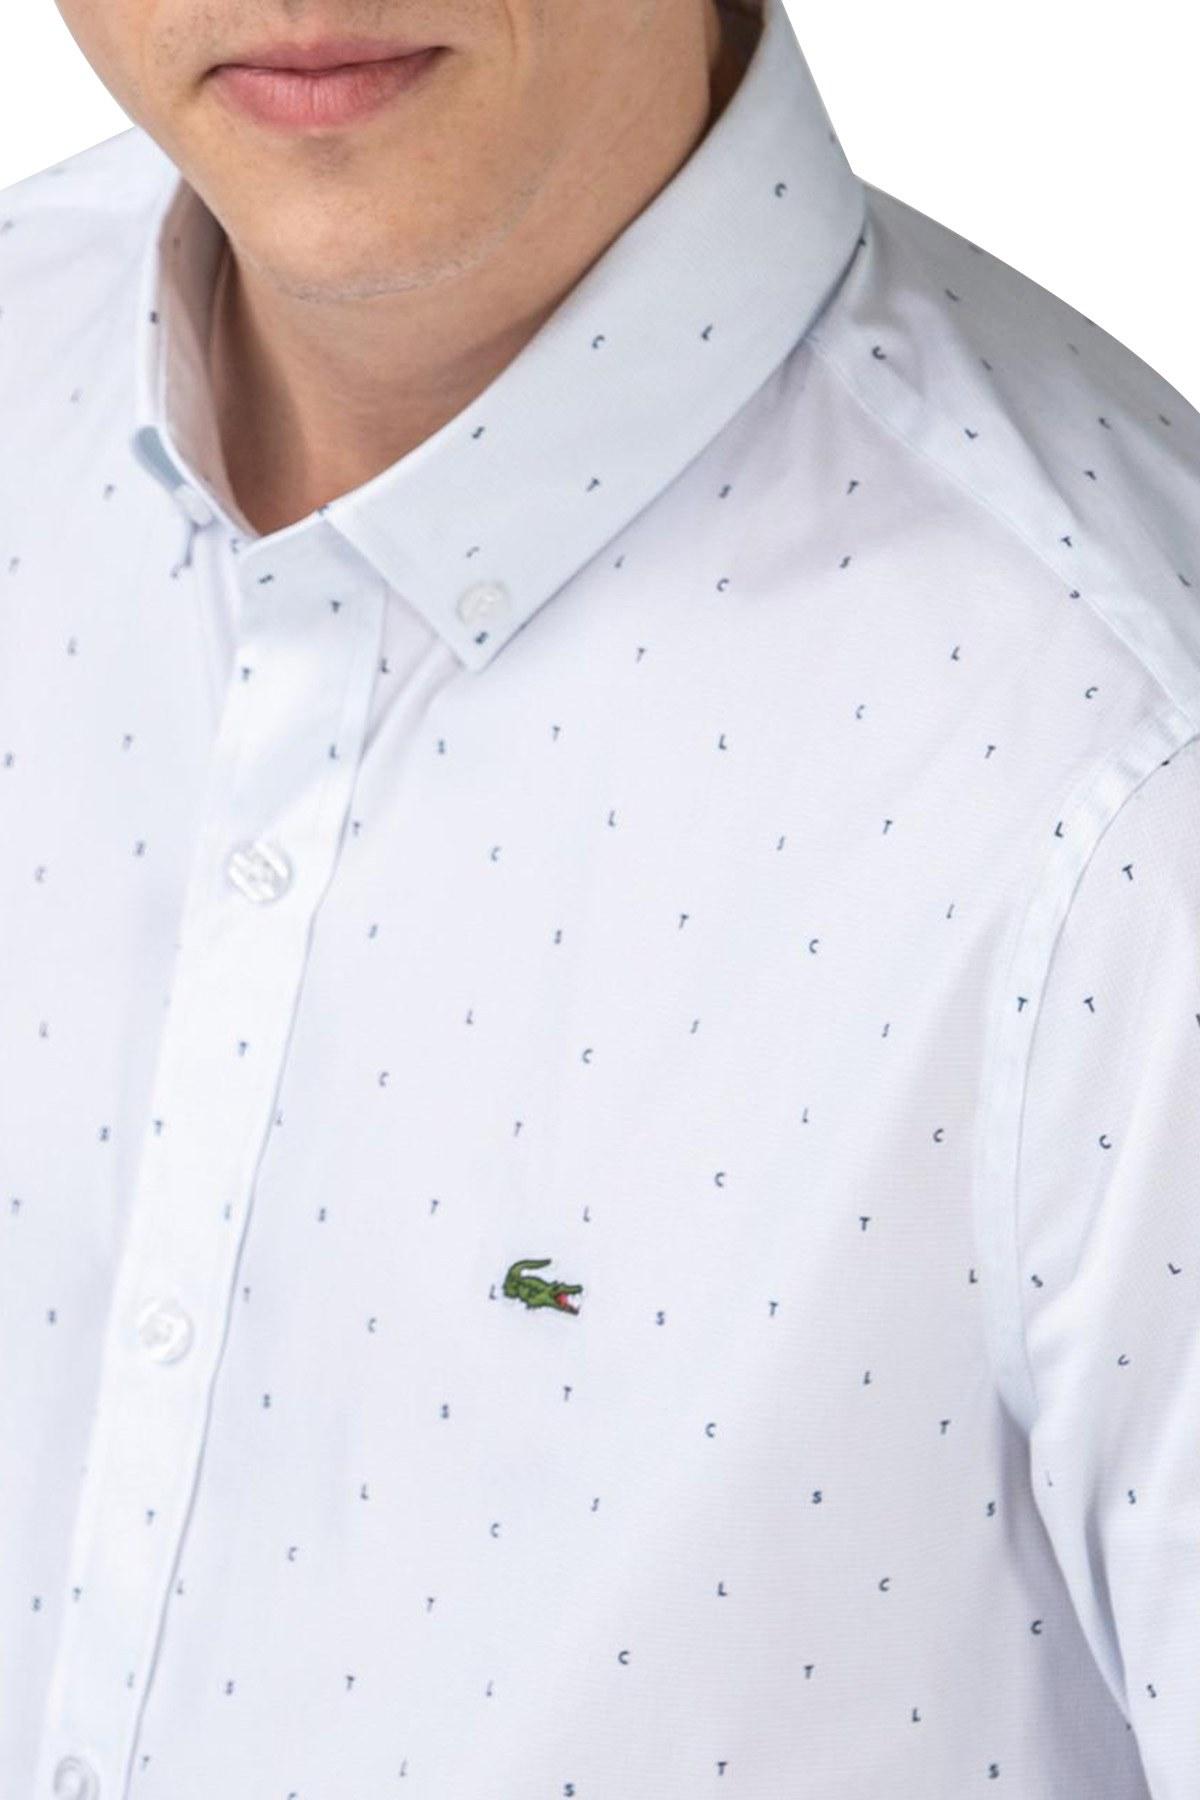 Lacoste Slim Fit Düğmeli Yaka Pamuklu Erkek Gömlek CH0175 75B BEYAZ